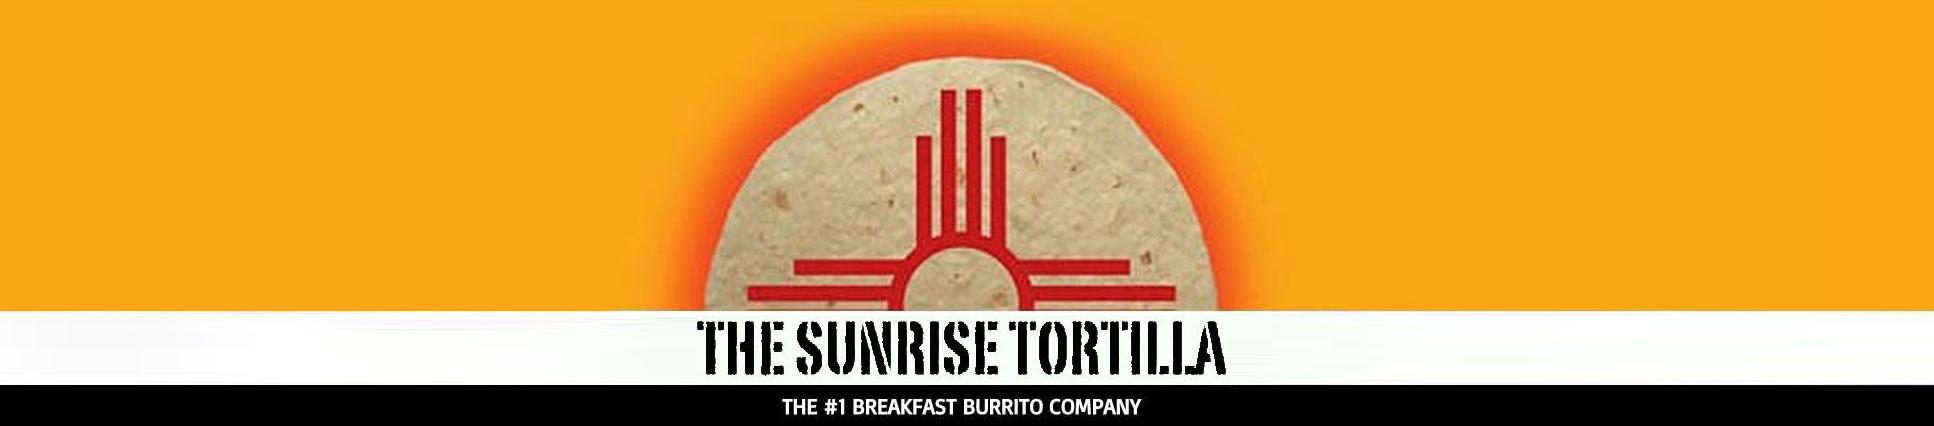 Sunrise Tortilla Home